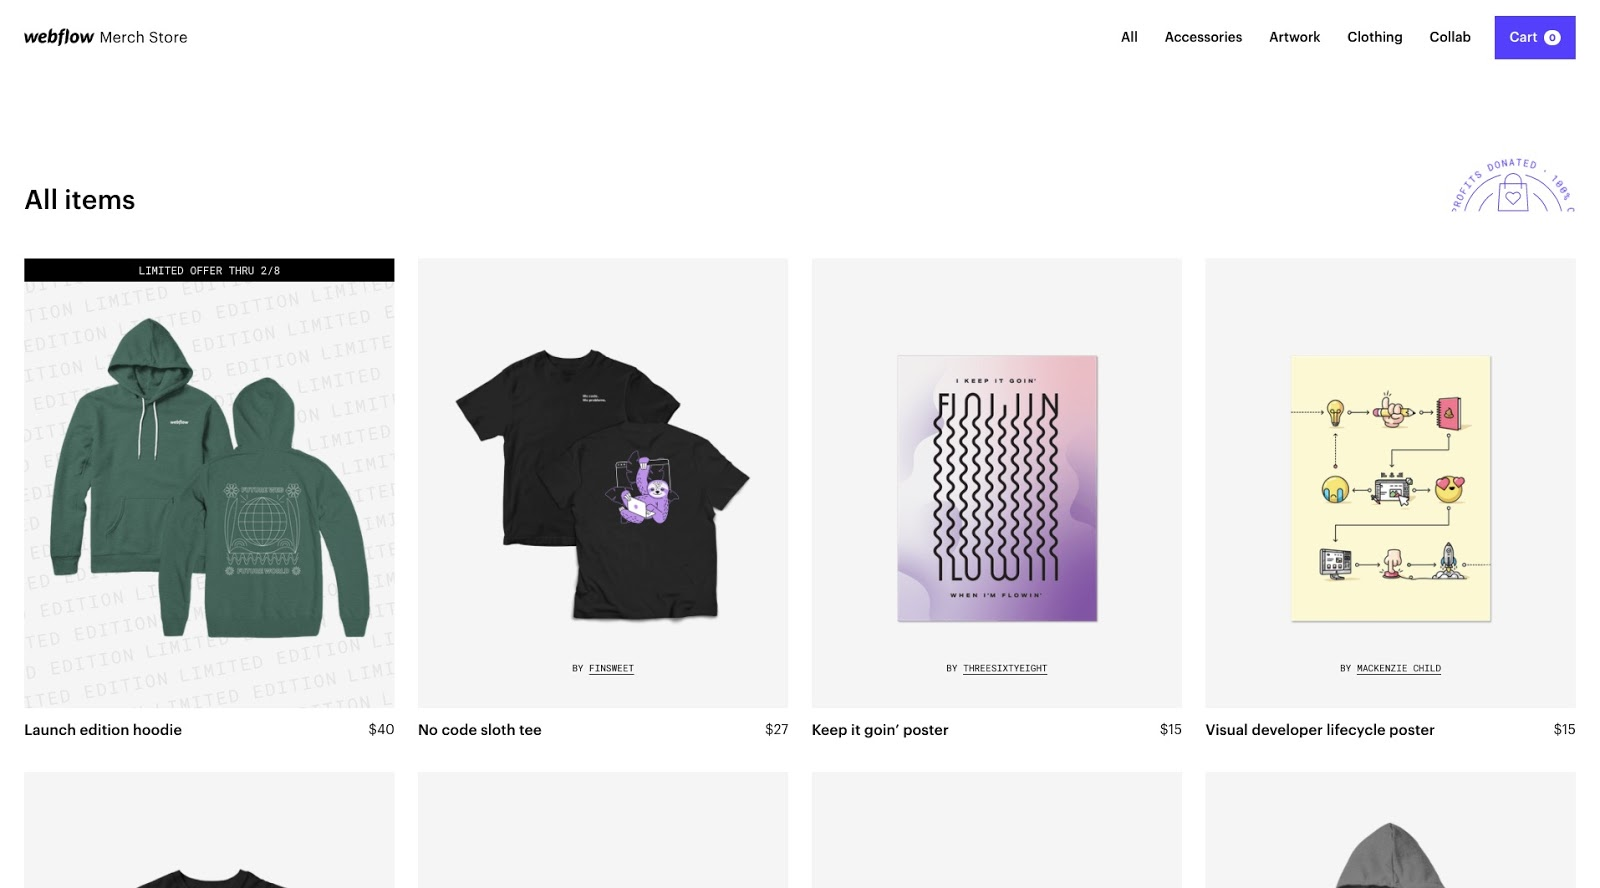 screenshot of the webflow merch store